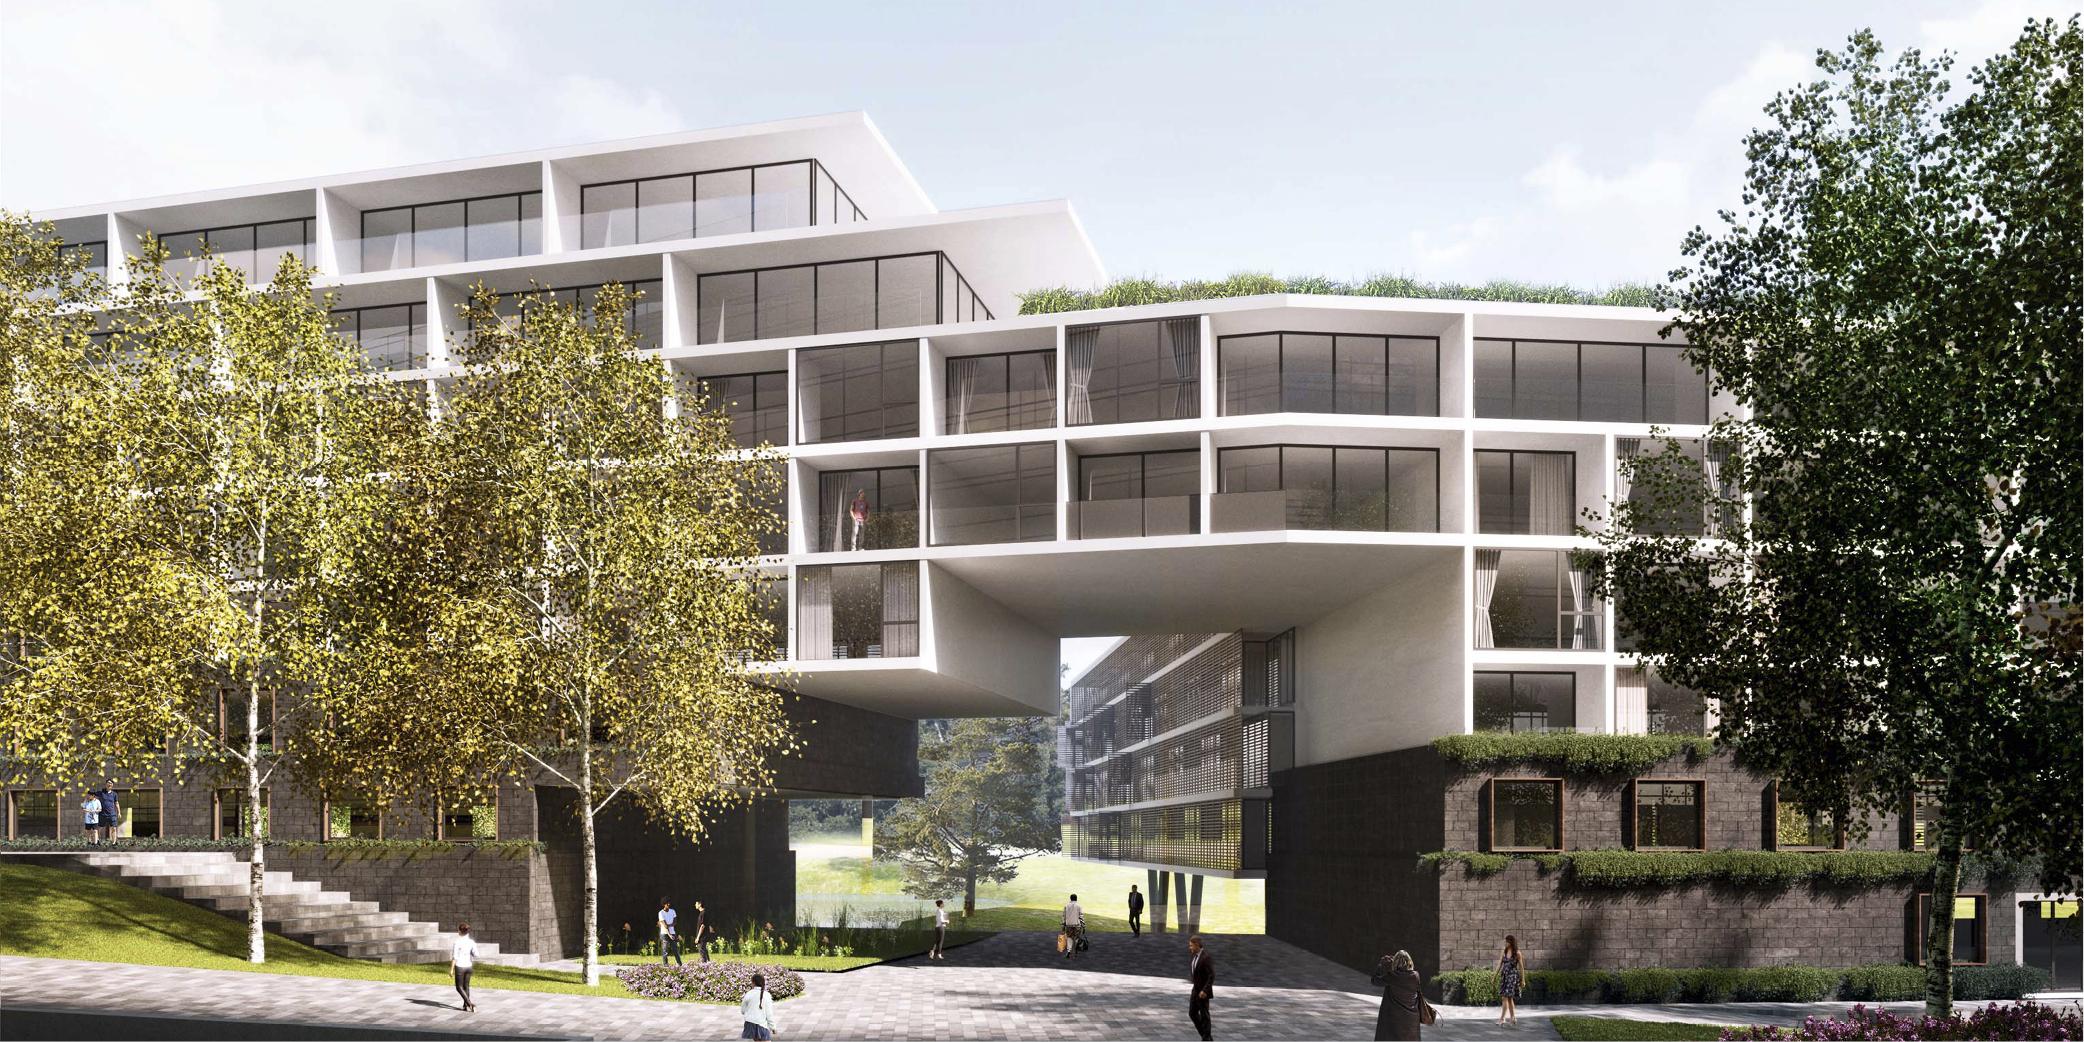 OCA architects Barcelona Prague House of Arboretum residential housing project Hernan Lleida Ruiz Bernardo Garcia Morales5